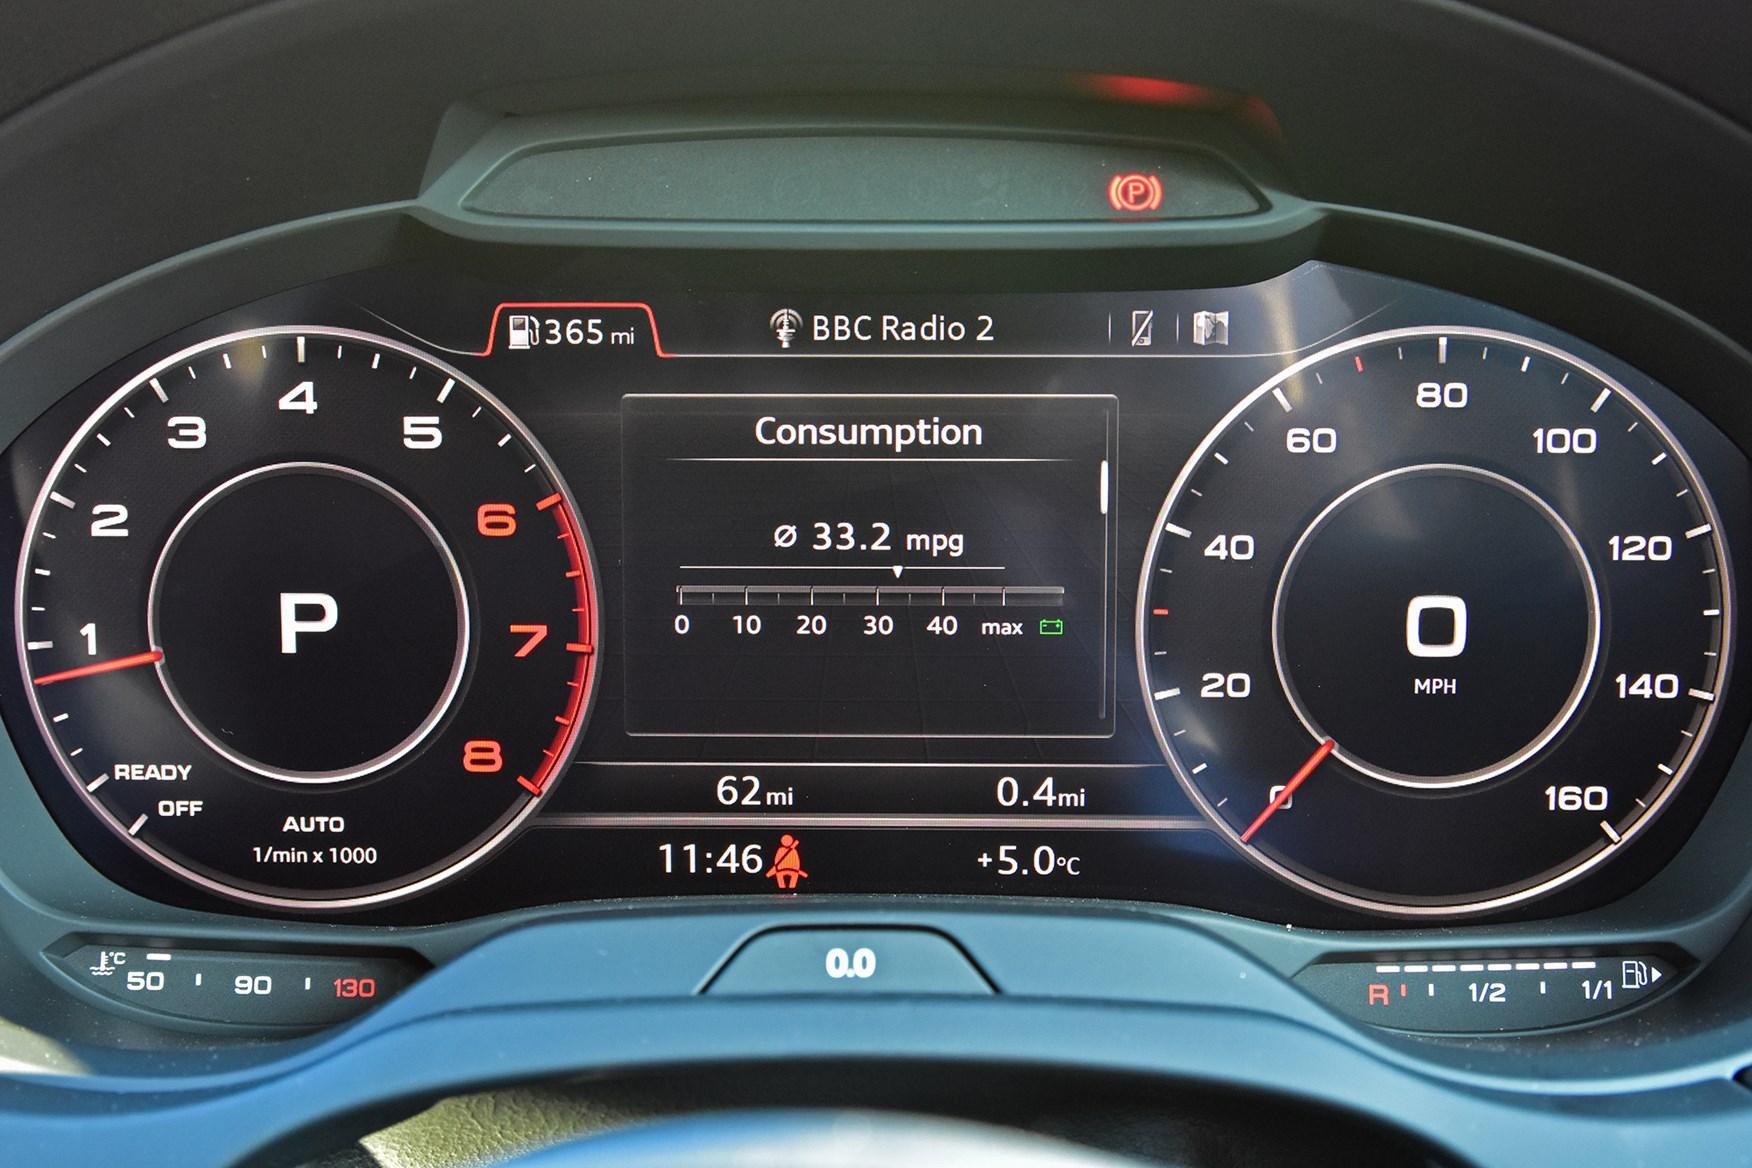 Audi A3 Saloon fuel economy